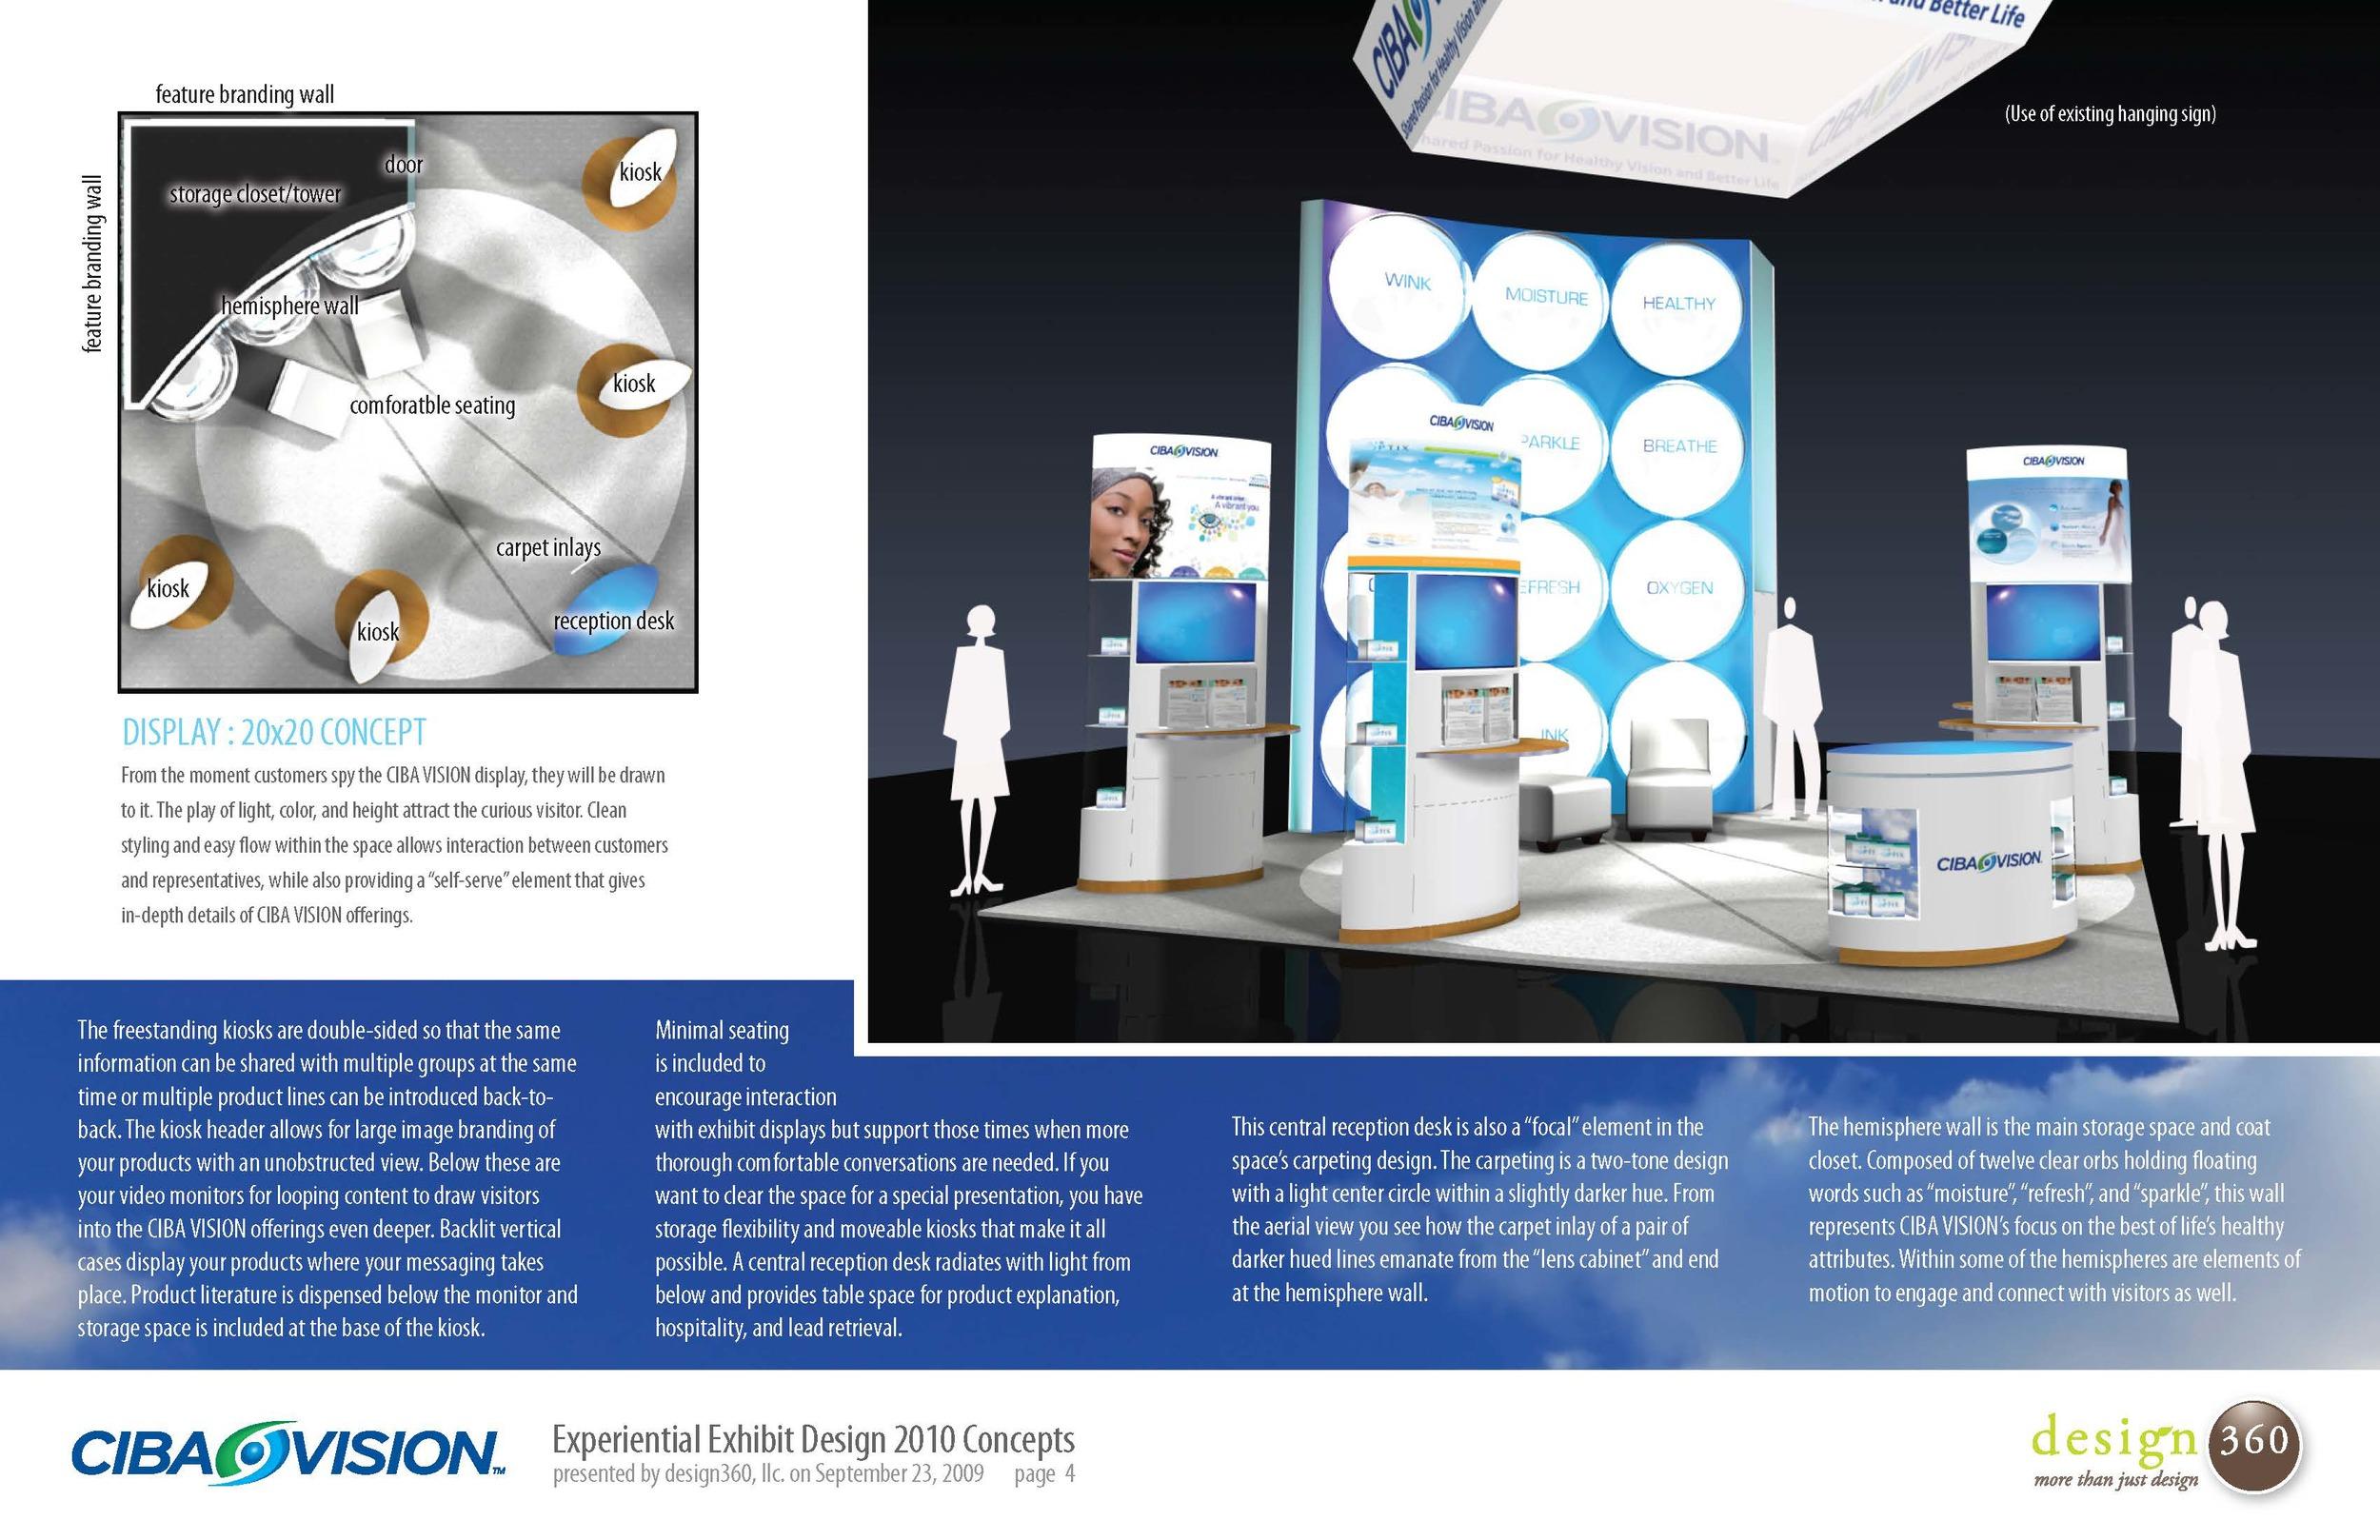 design360_cibavision_page_4.jpg